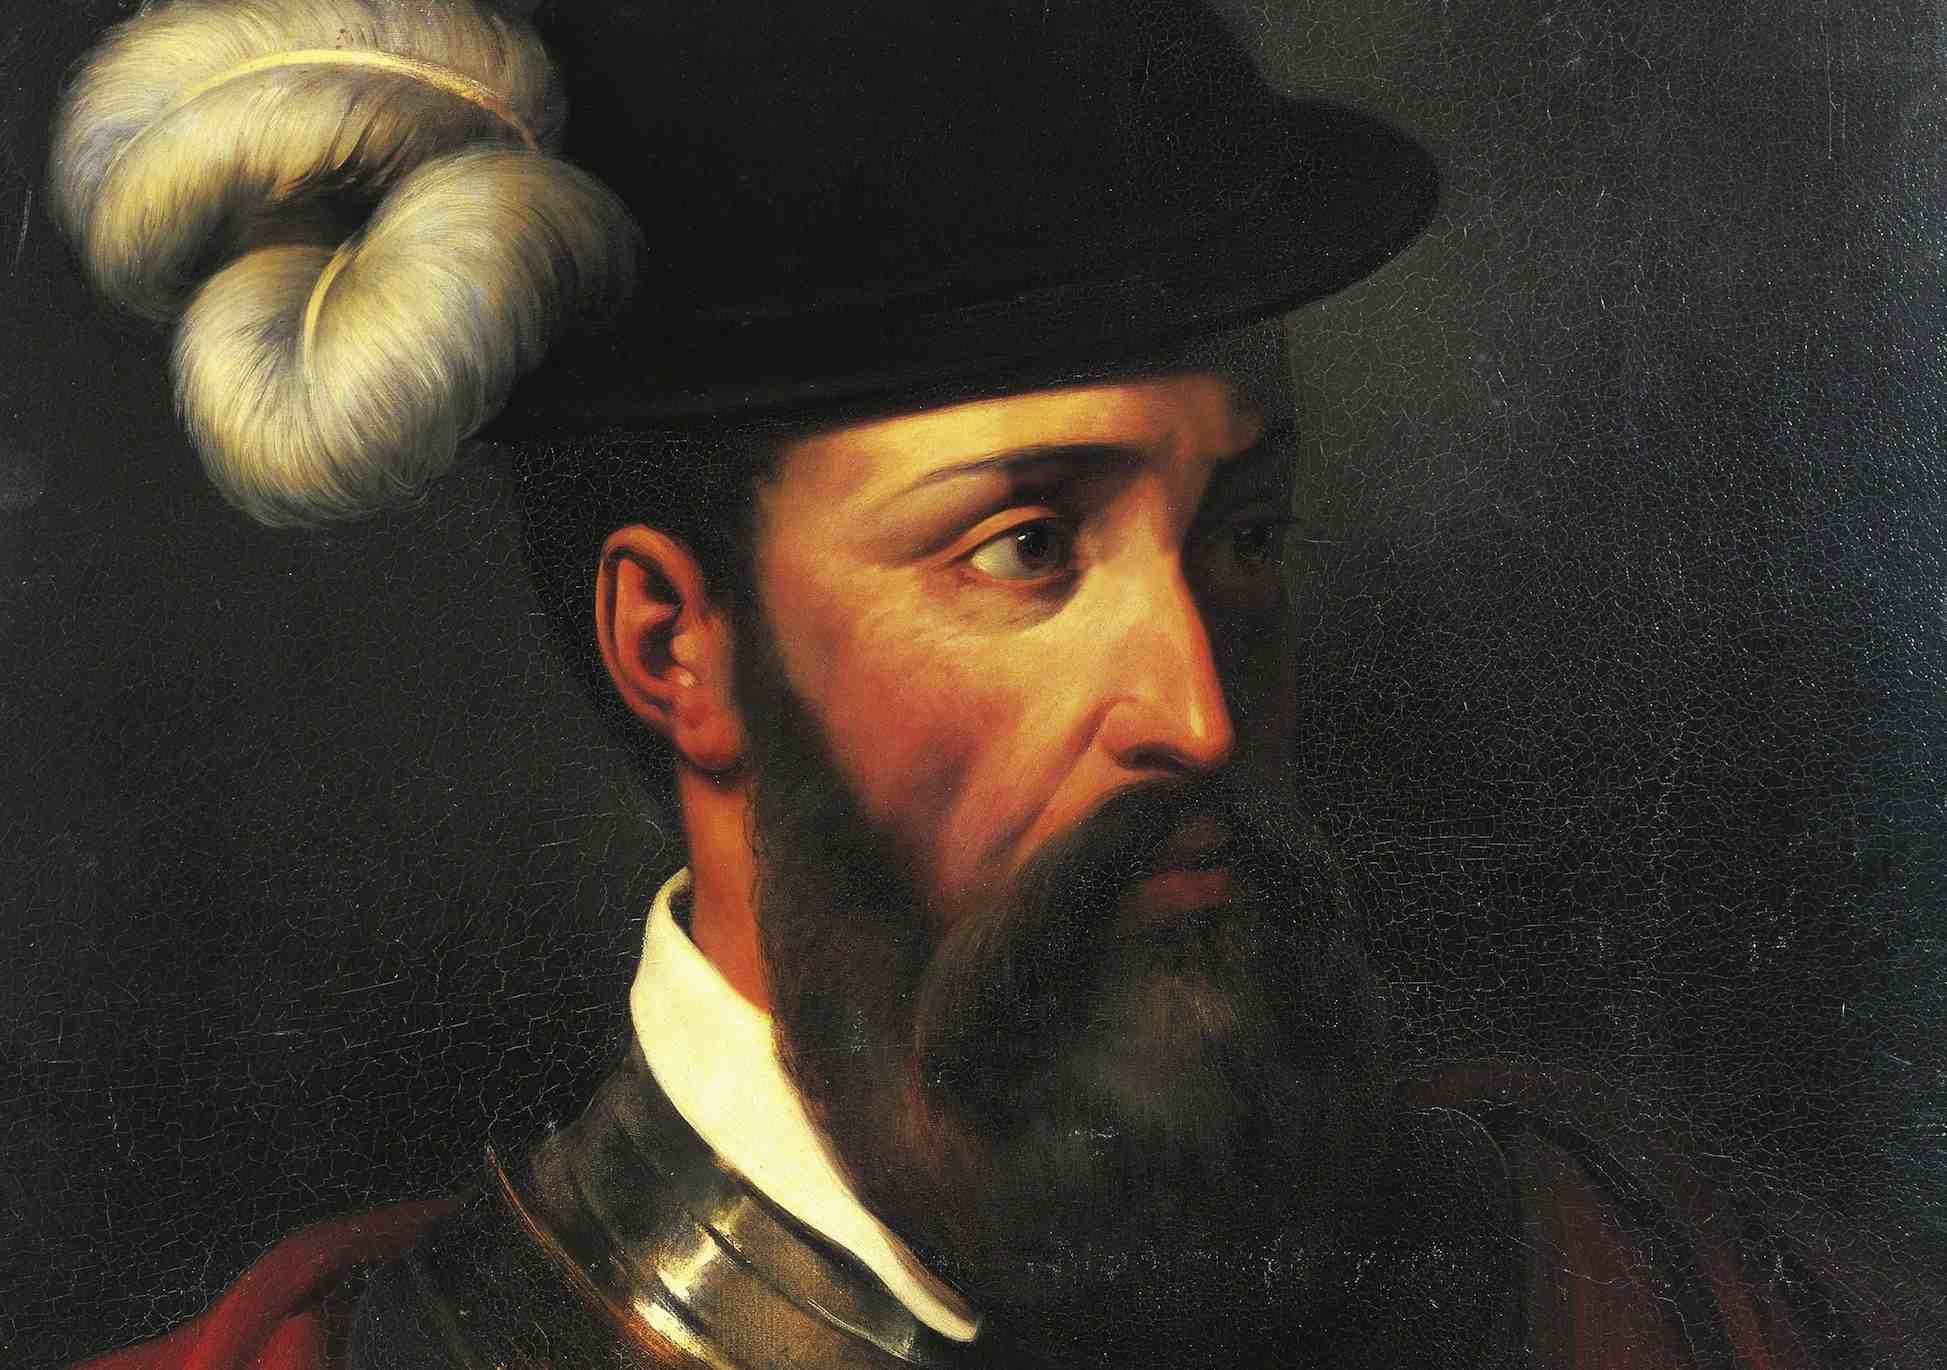 10 facts about spanish conquistador francisco pizarro